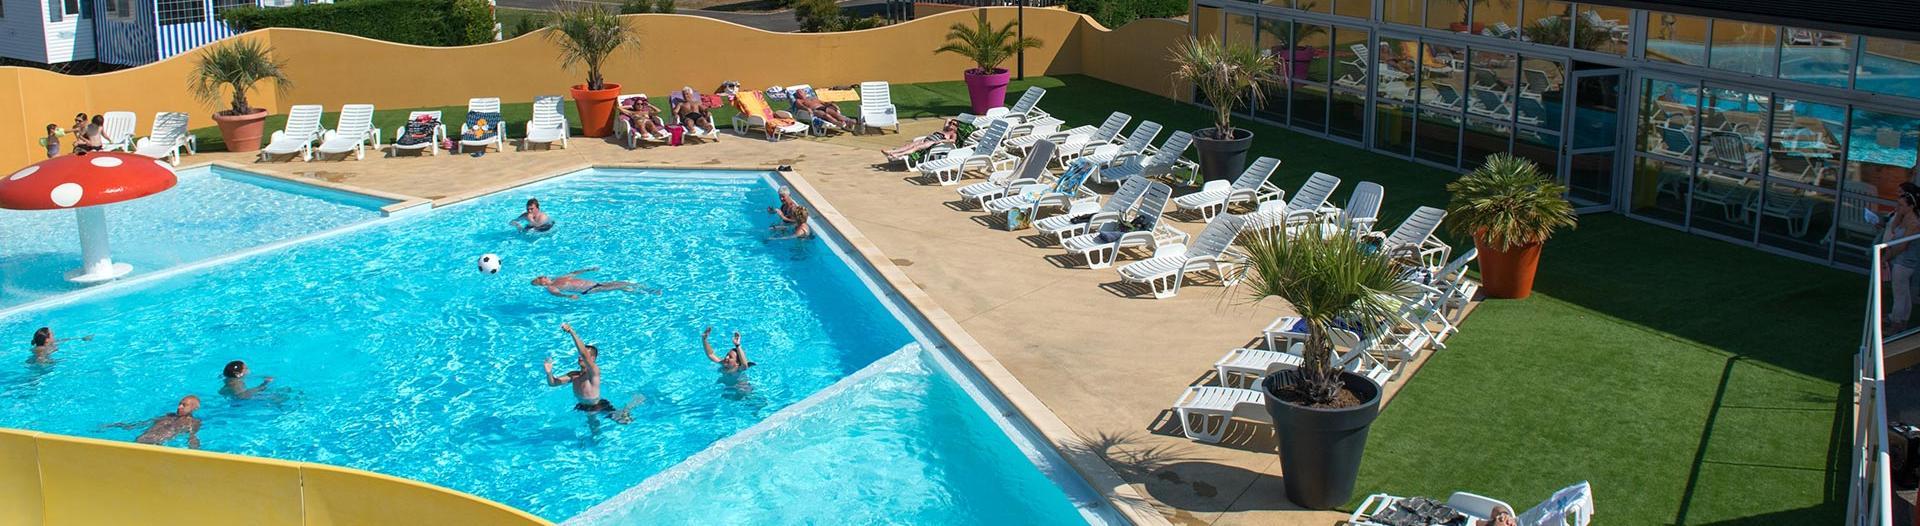 slider-camping-bel-air-olonne-vue-piscine